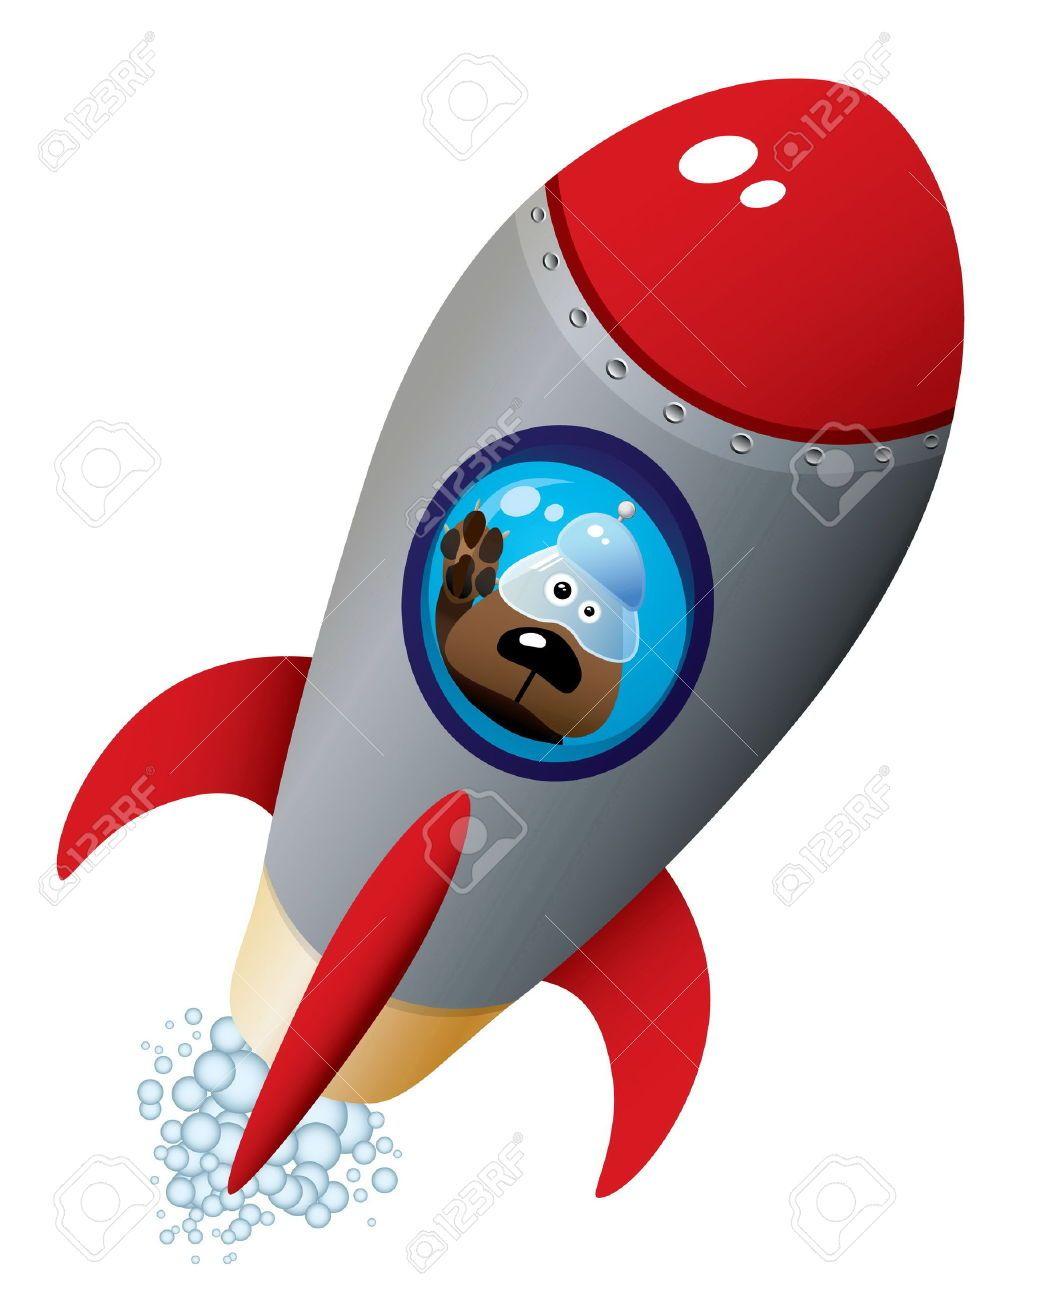 Google search modern art. Spaceship clipart water bottle rocket